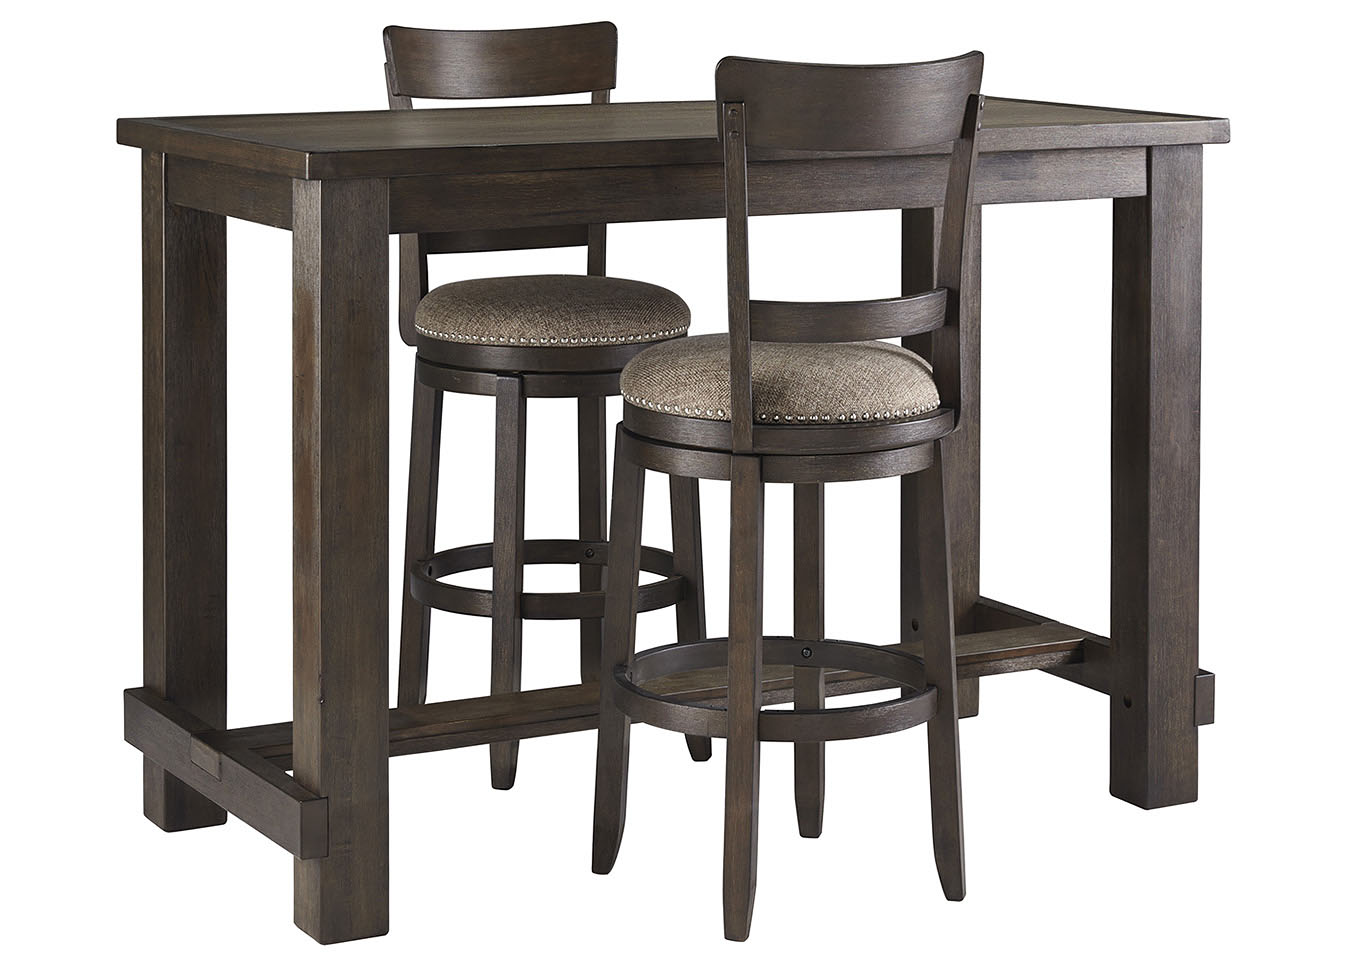 Drewing Bar Table w/8 Barstools Ashley Furniture Homestore